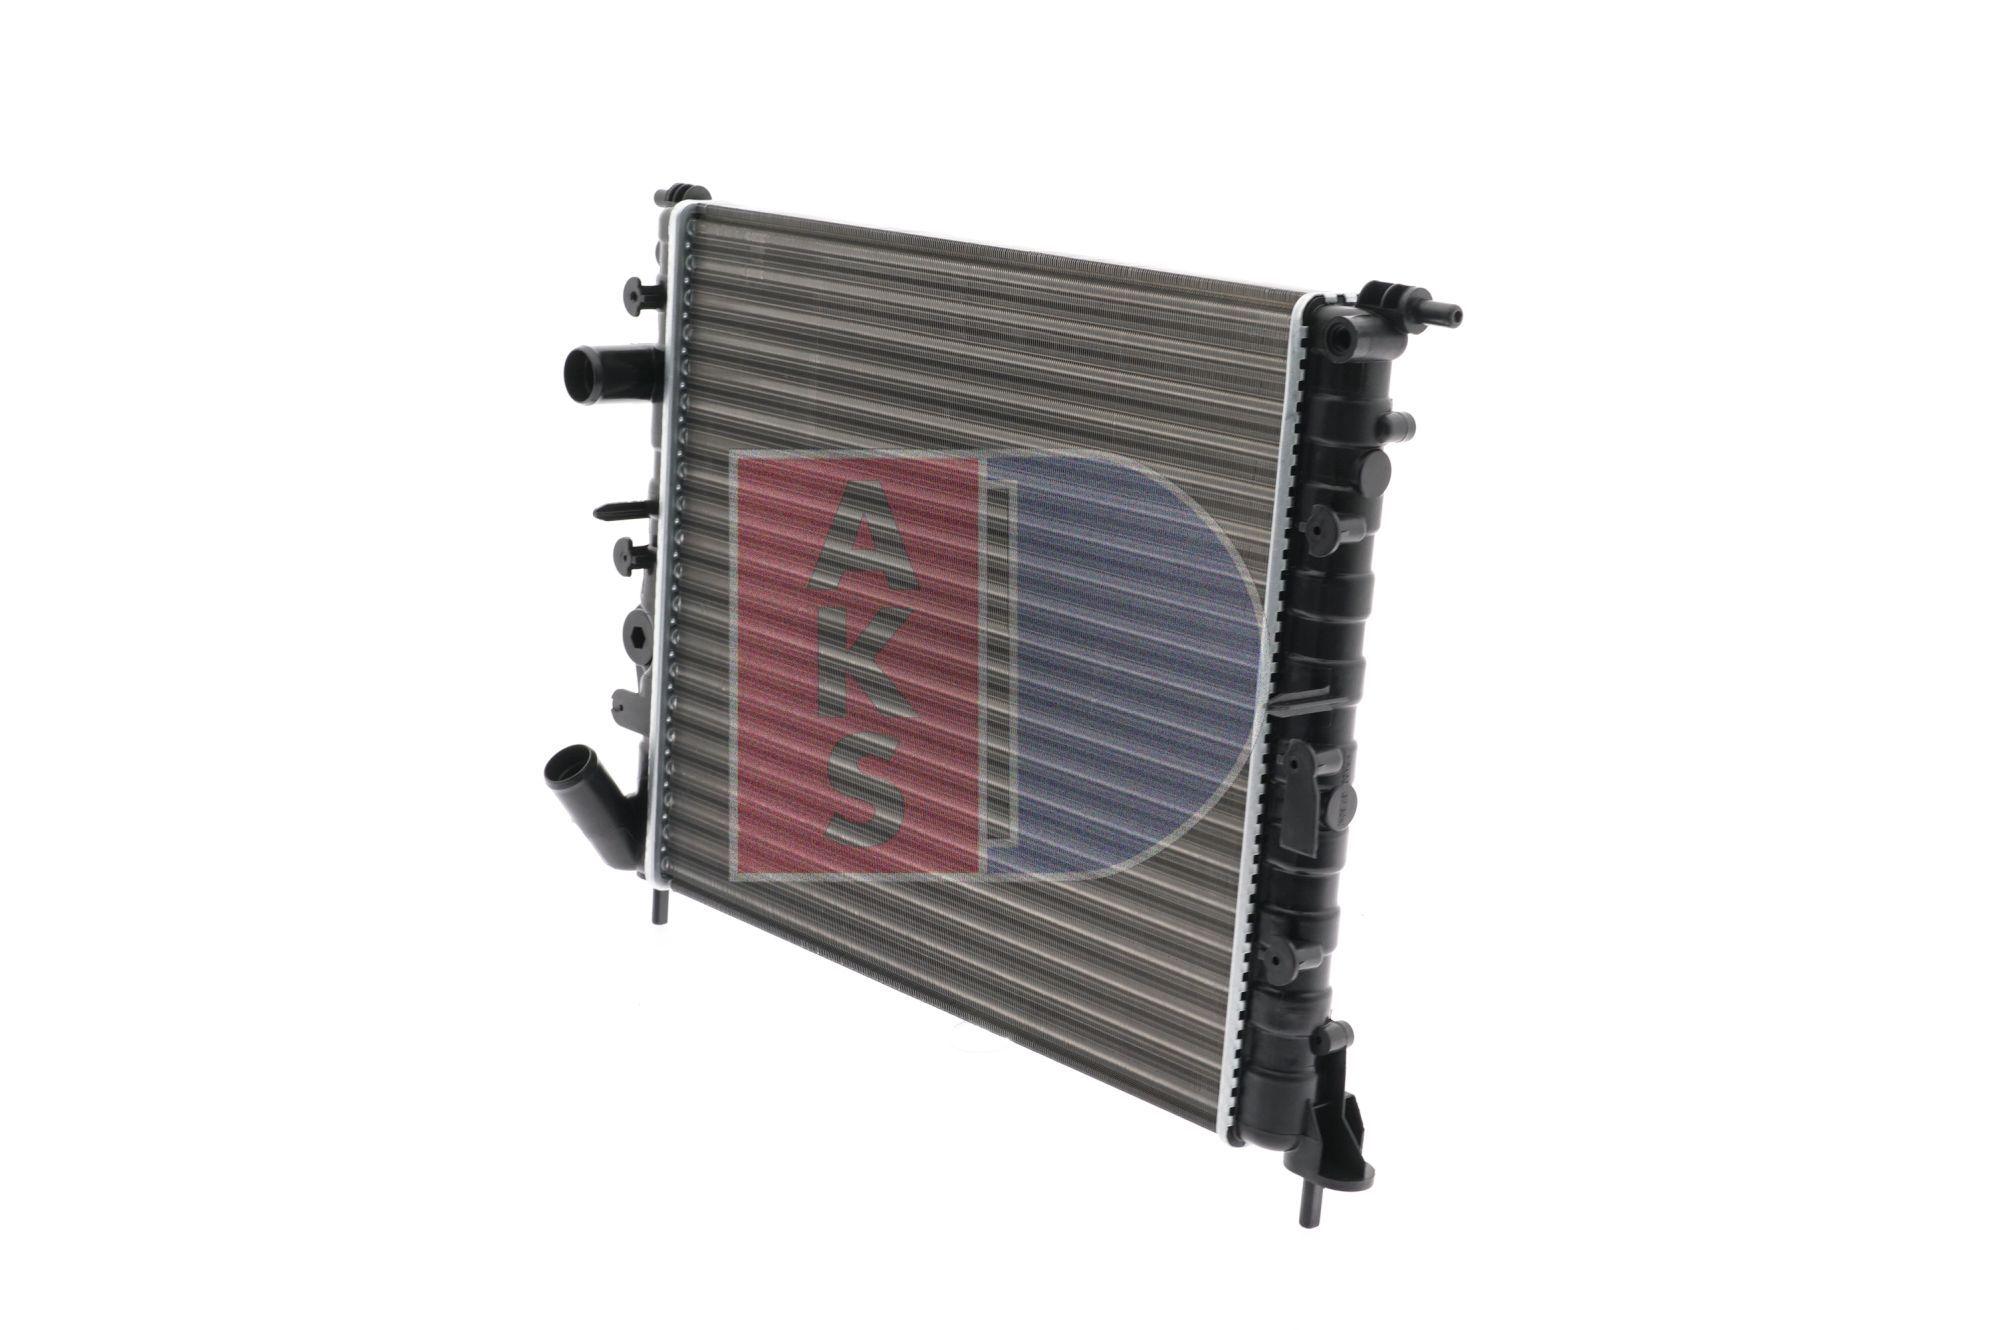 180240N Kühler AKS DASIS - Markenprodukte billig